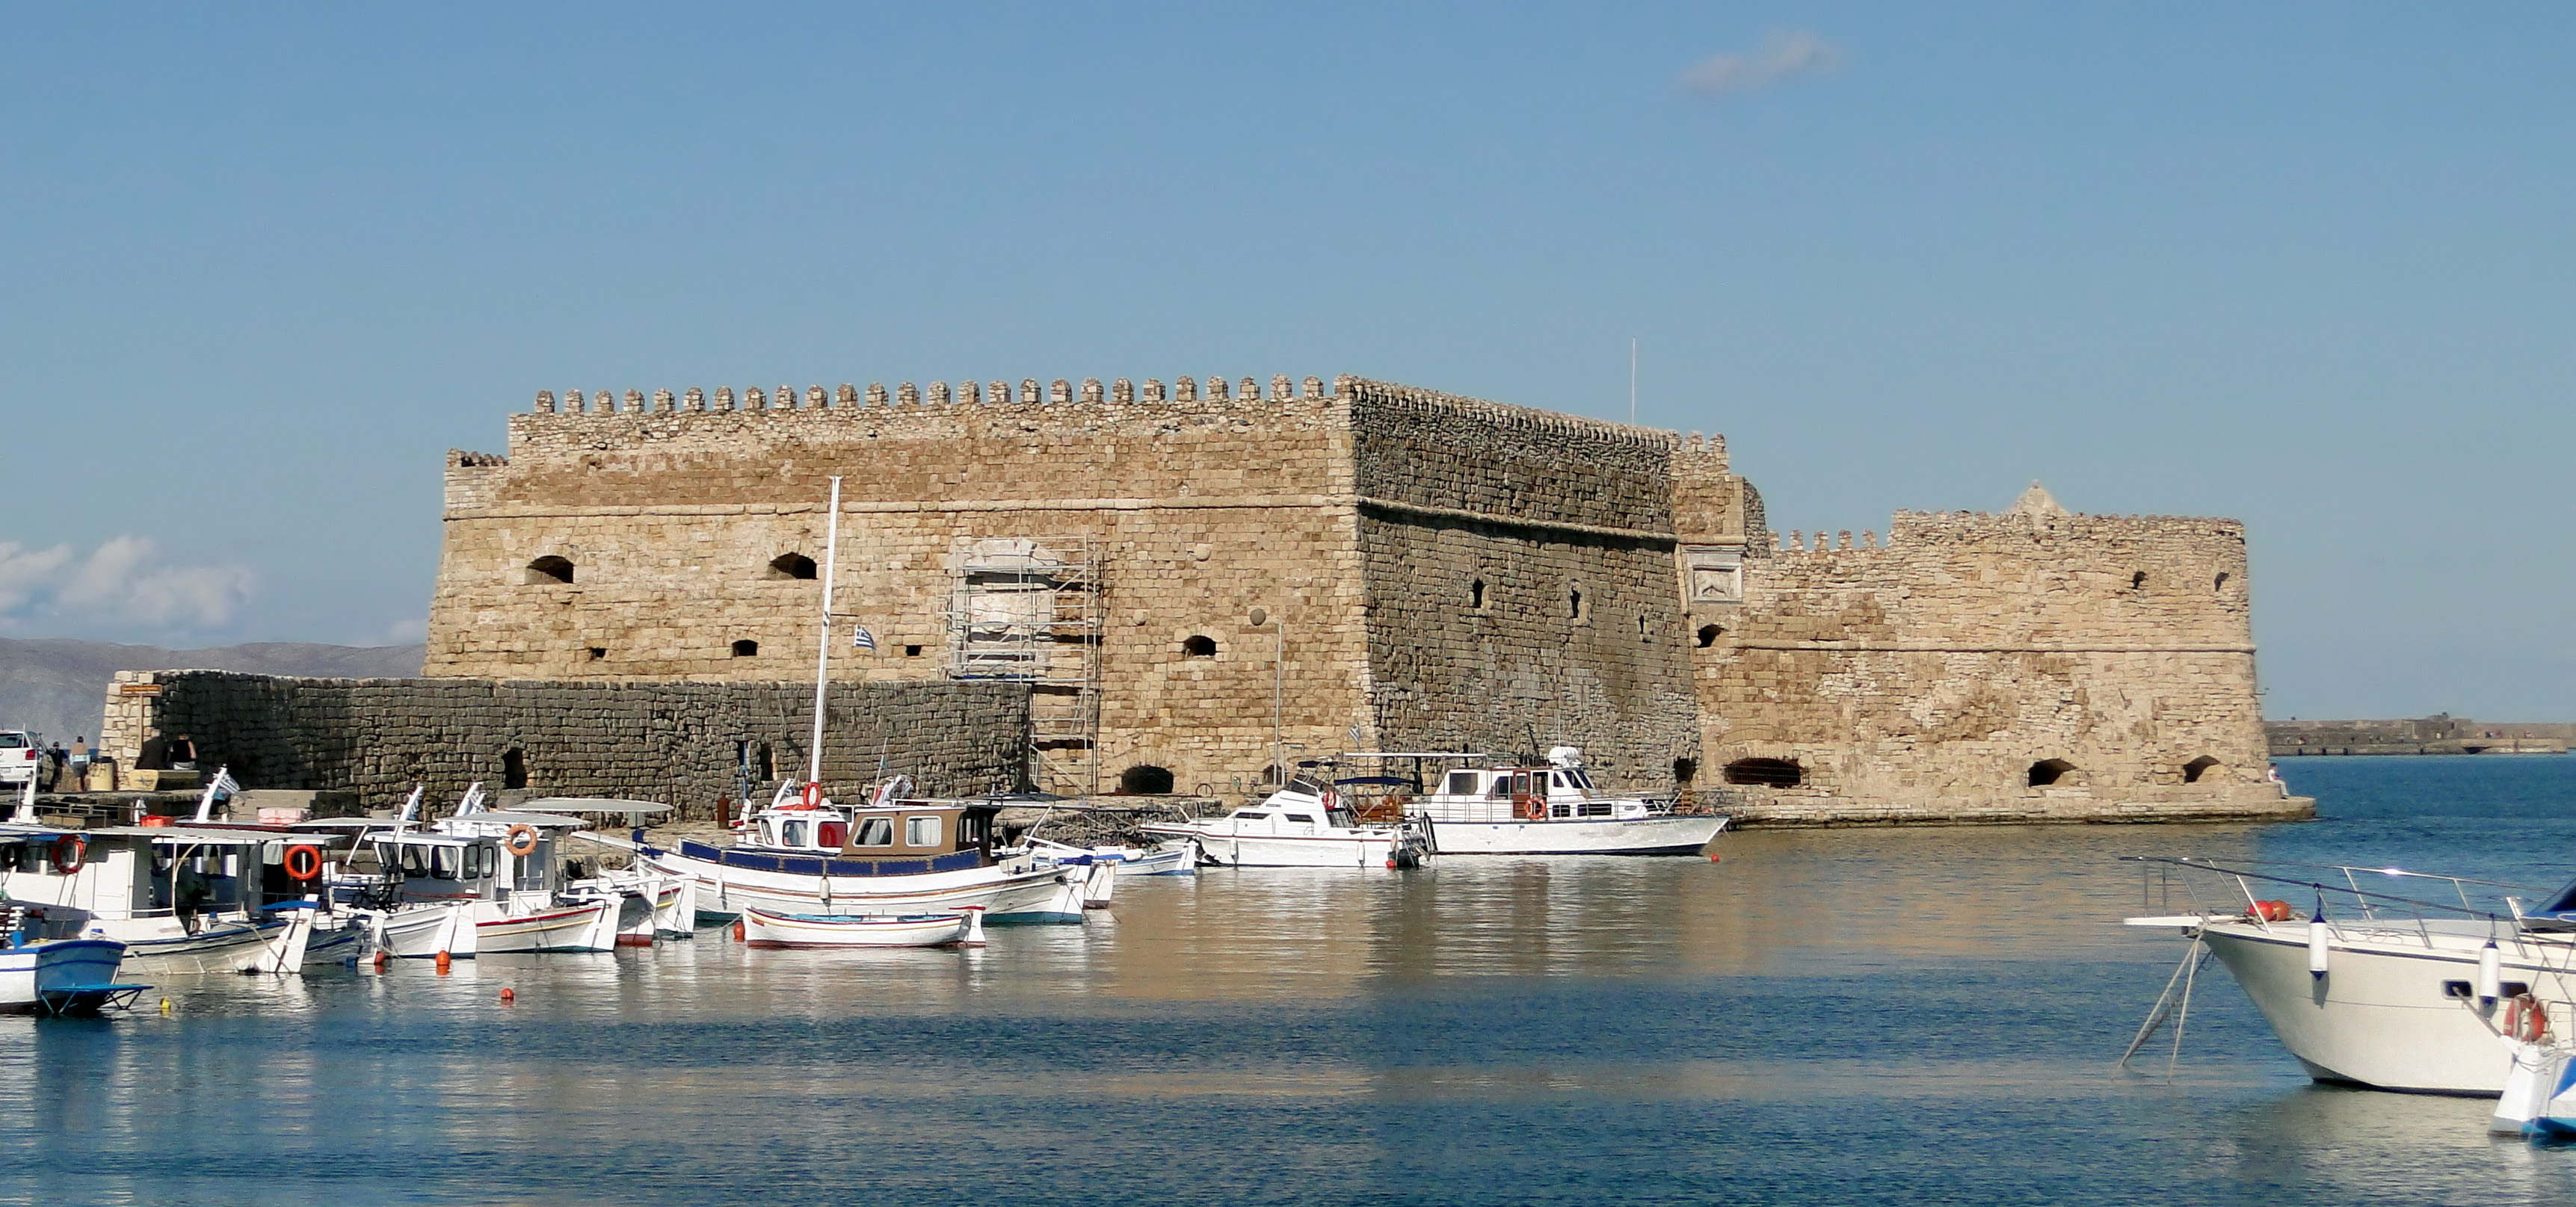 Koules Fortress  Military Wiki  FANDOM powered by Wikia